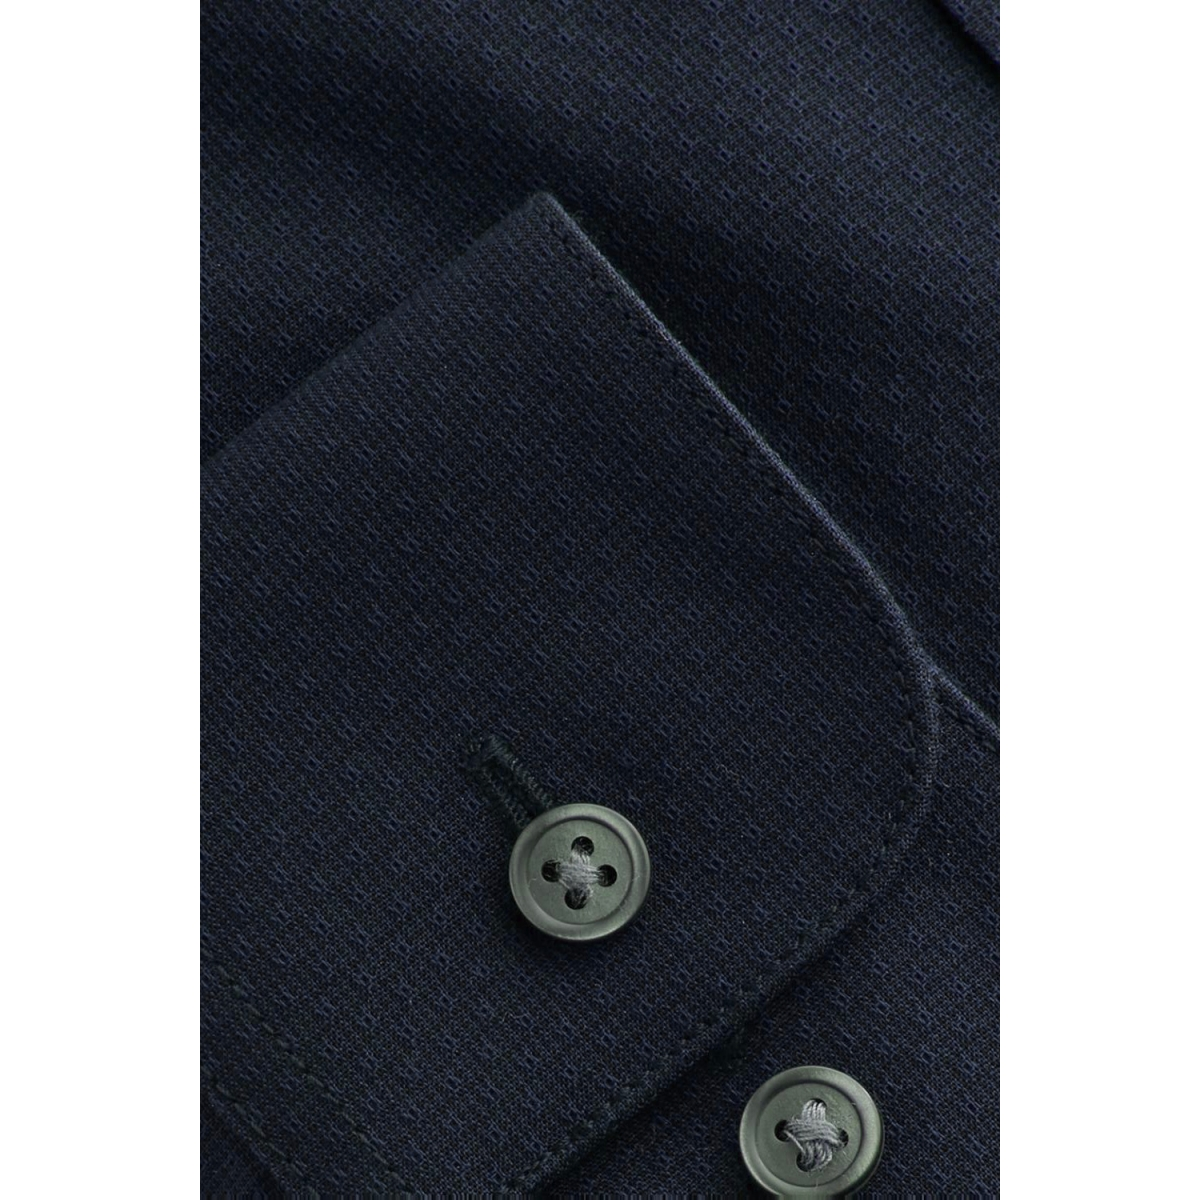 jprjenson shirt l/s noos 12125174 jack & jones overhemd navy blazer